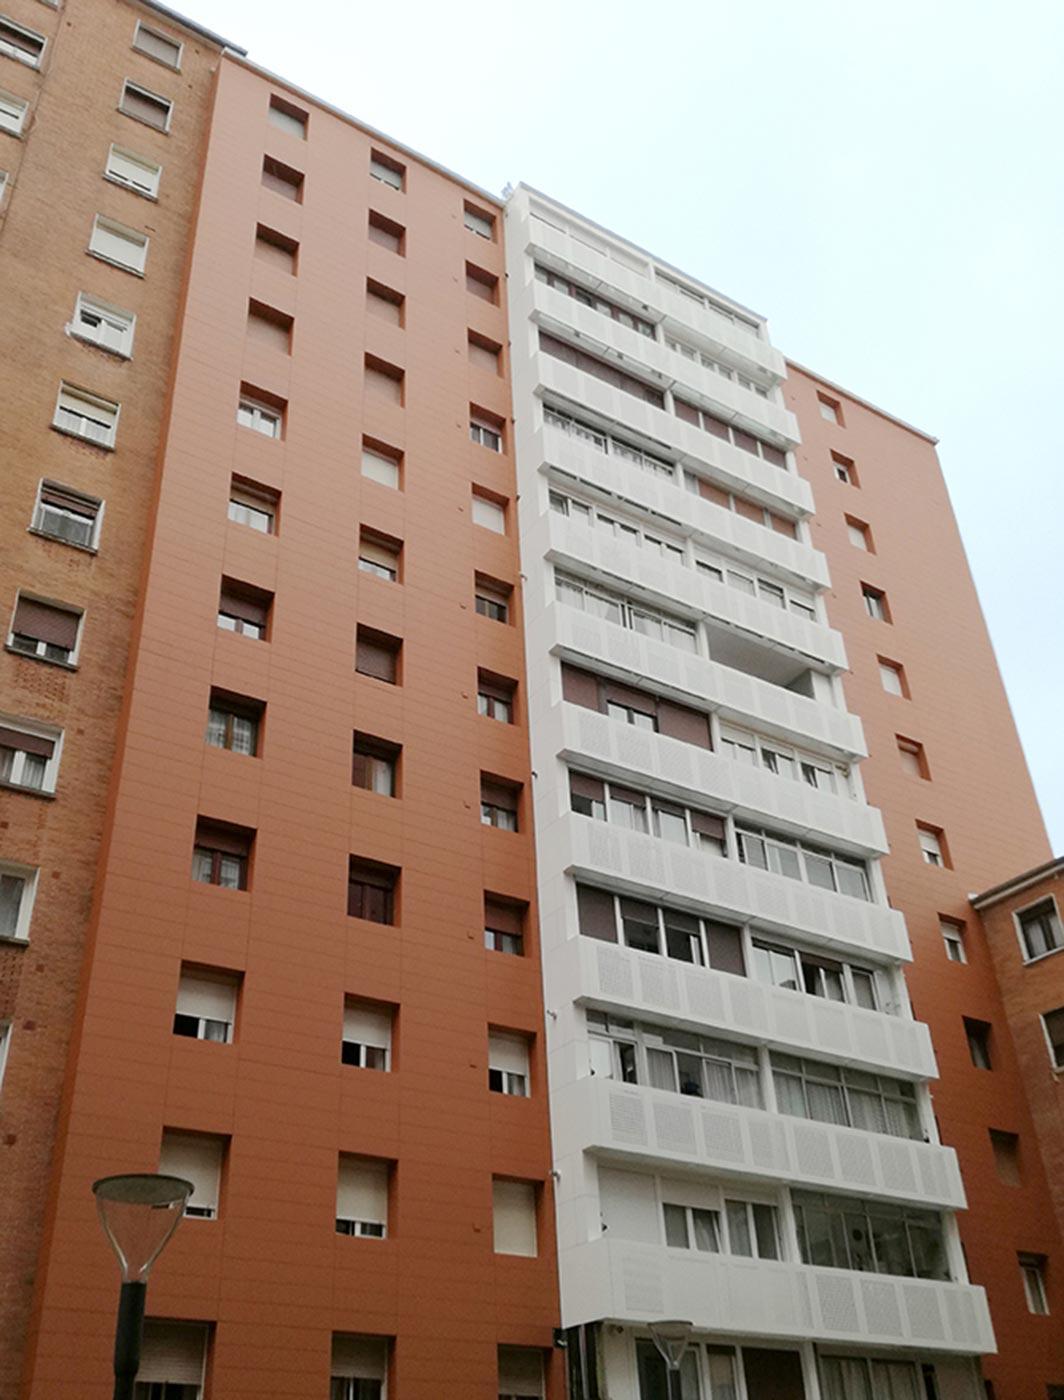 Viviendas-Barrio-Sagarminaga.-Traffic-White-9016.-Triana-Brown_00_1592990588.jpg